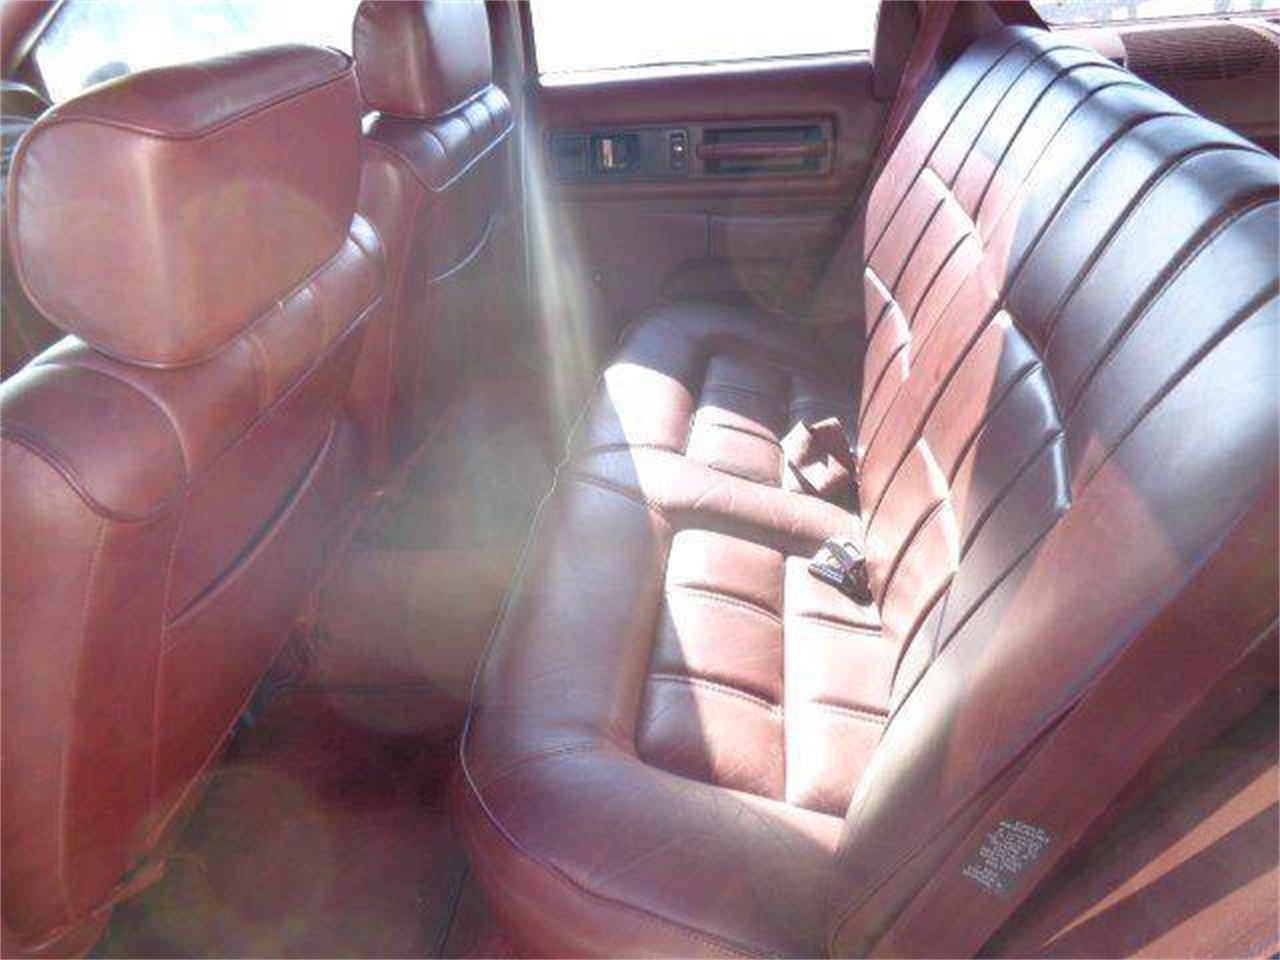 1991 Oldsmobile Custom Cruiser (CC-1045461) for sale in Staunton, Illinois